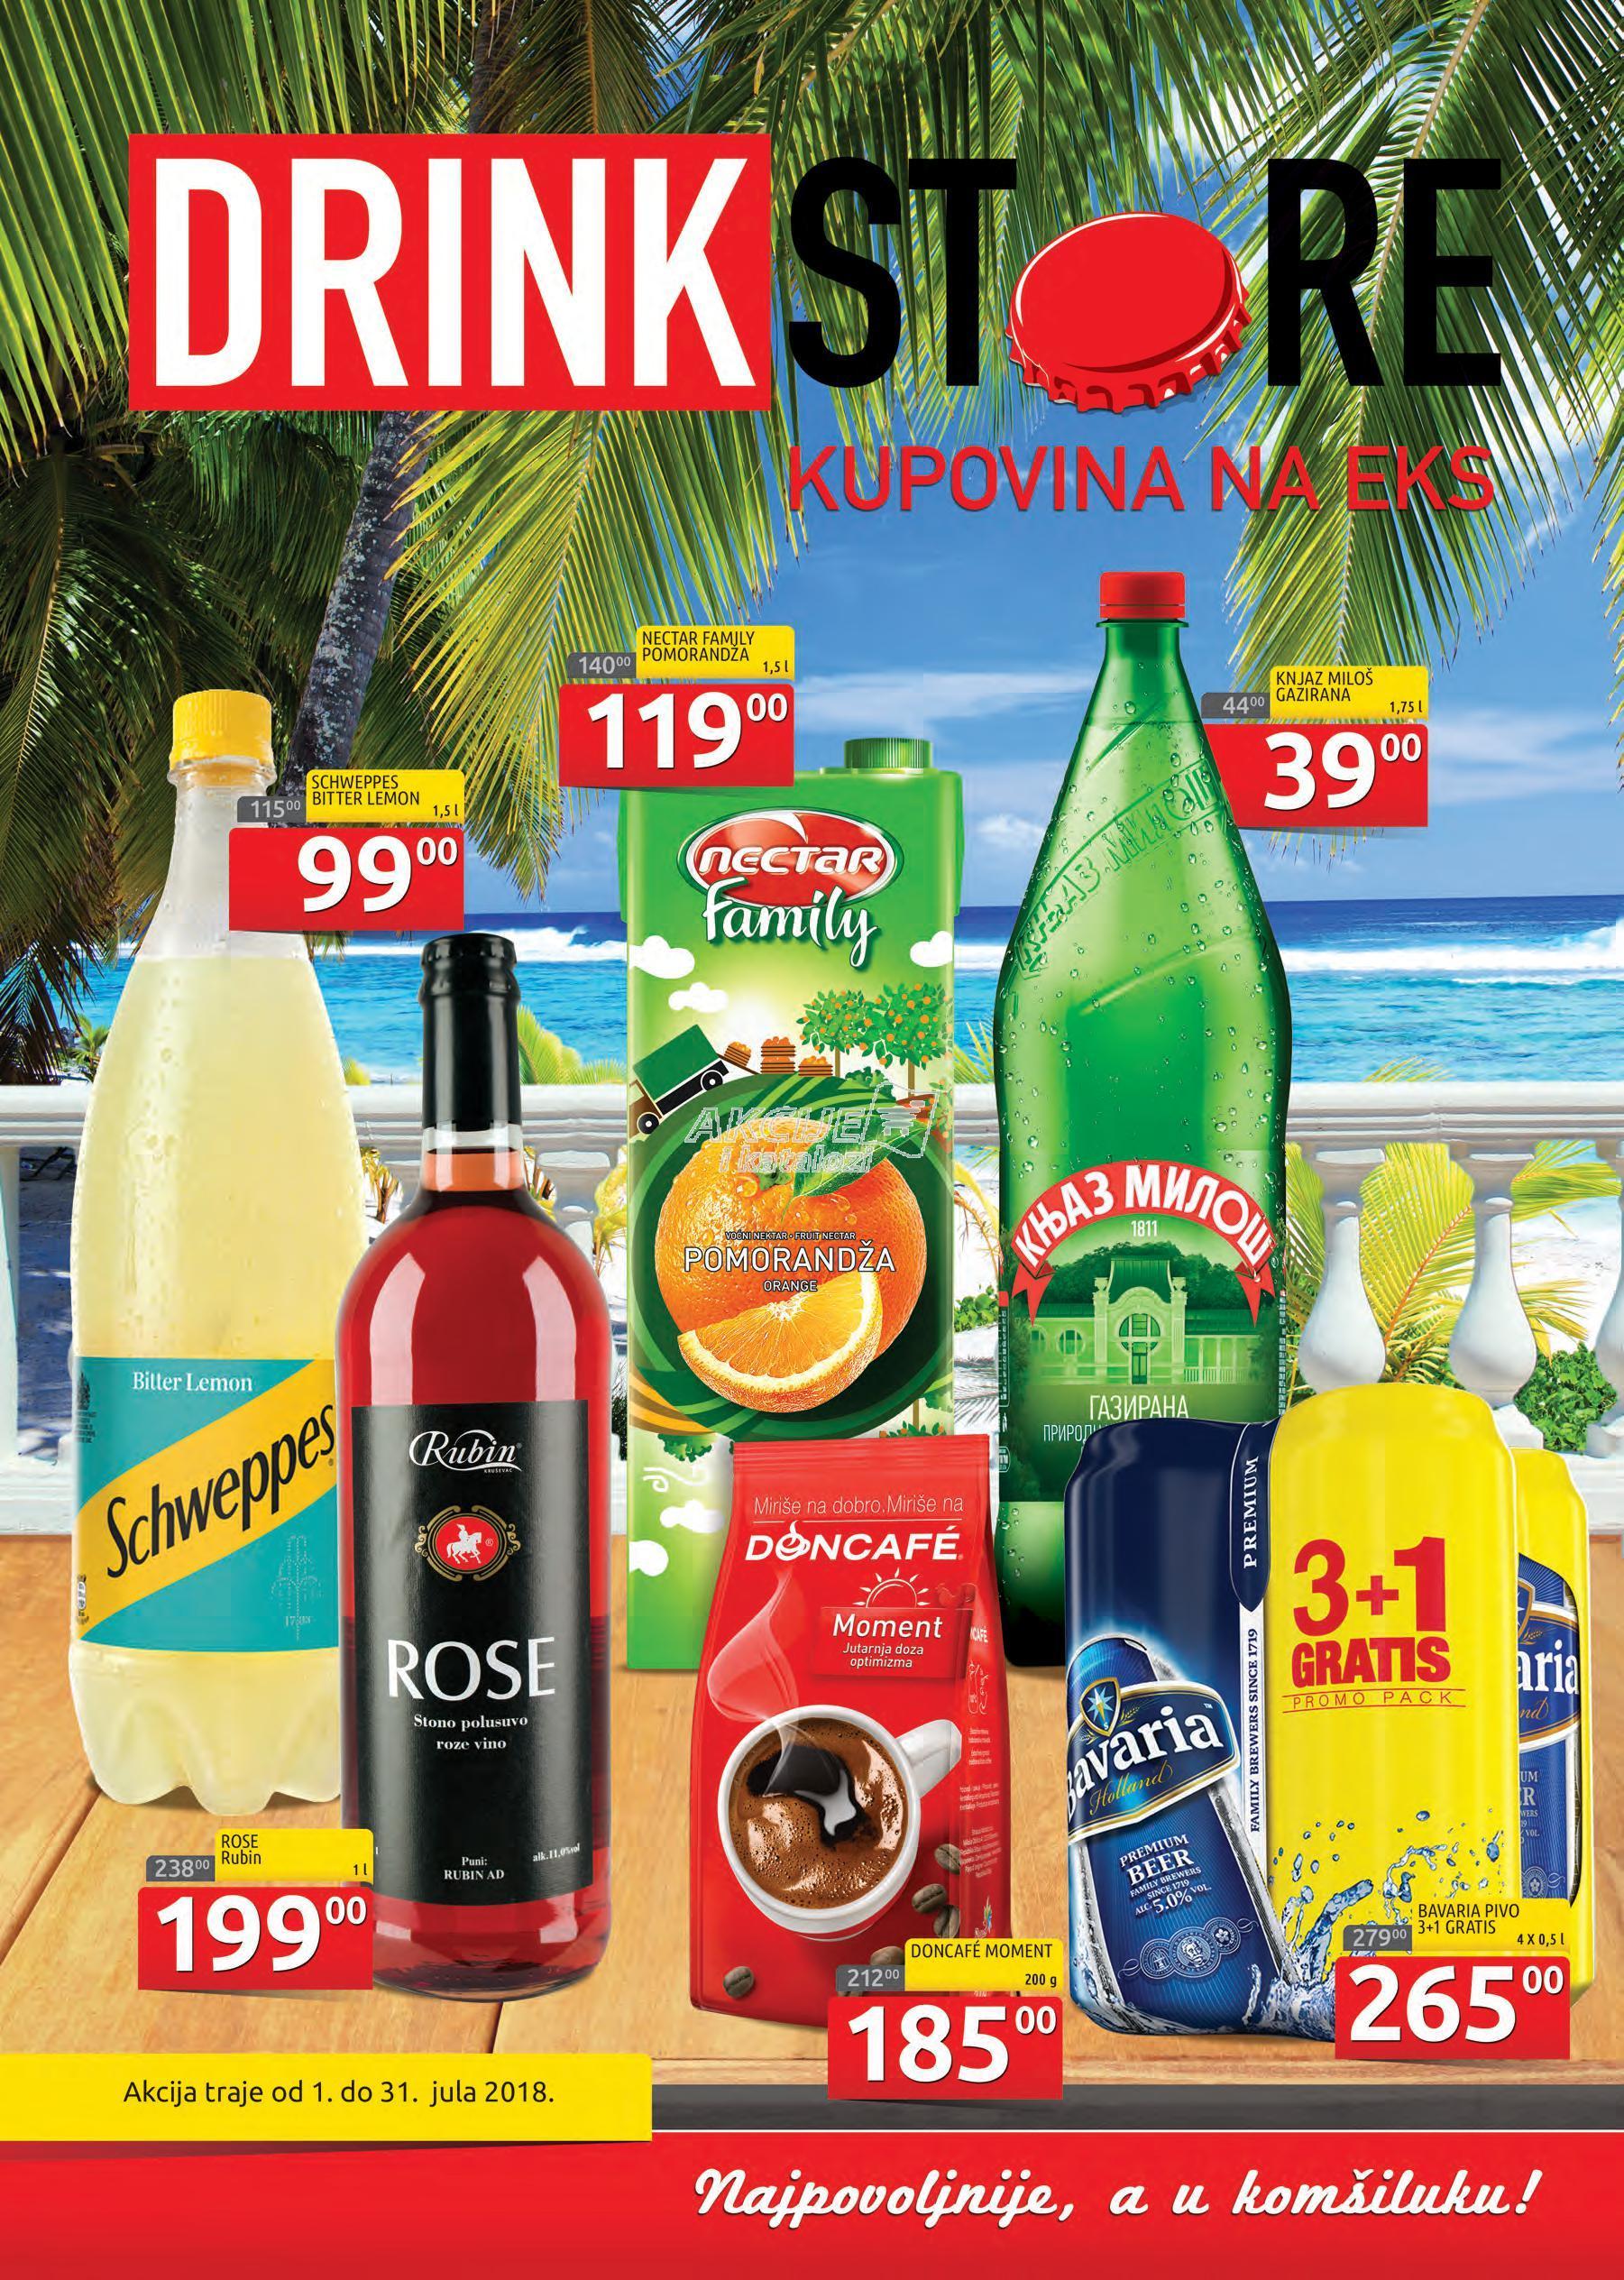 Drink Store akcija letnje kupovine